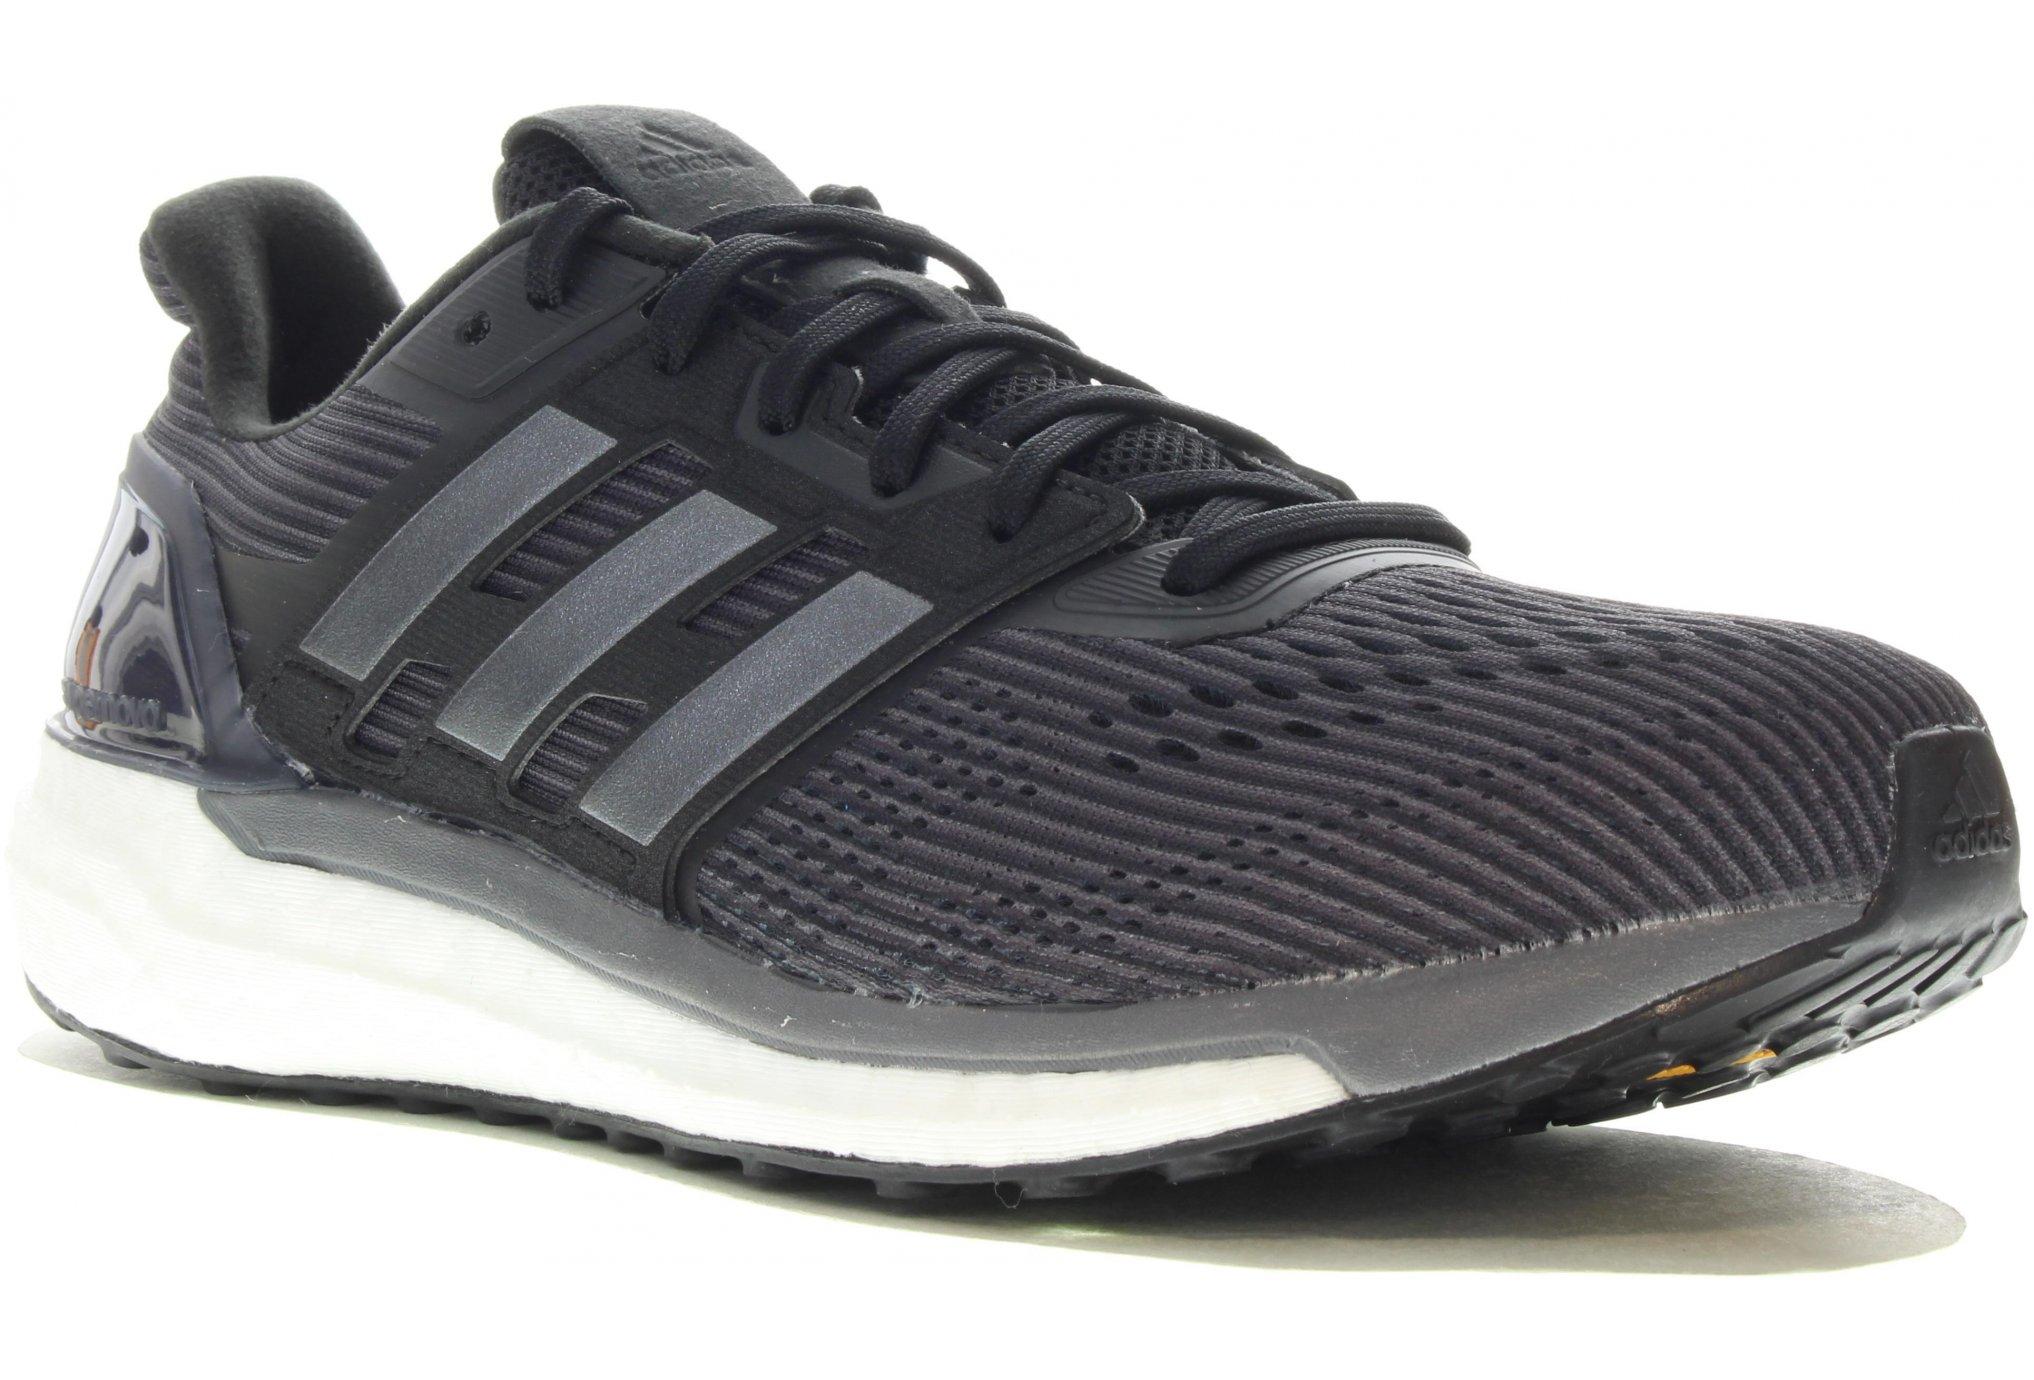 adidas supernova w chaussures running femme 172761 1 fz